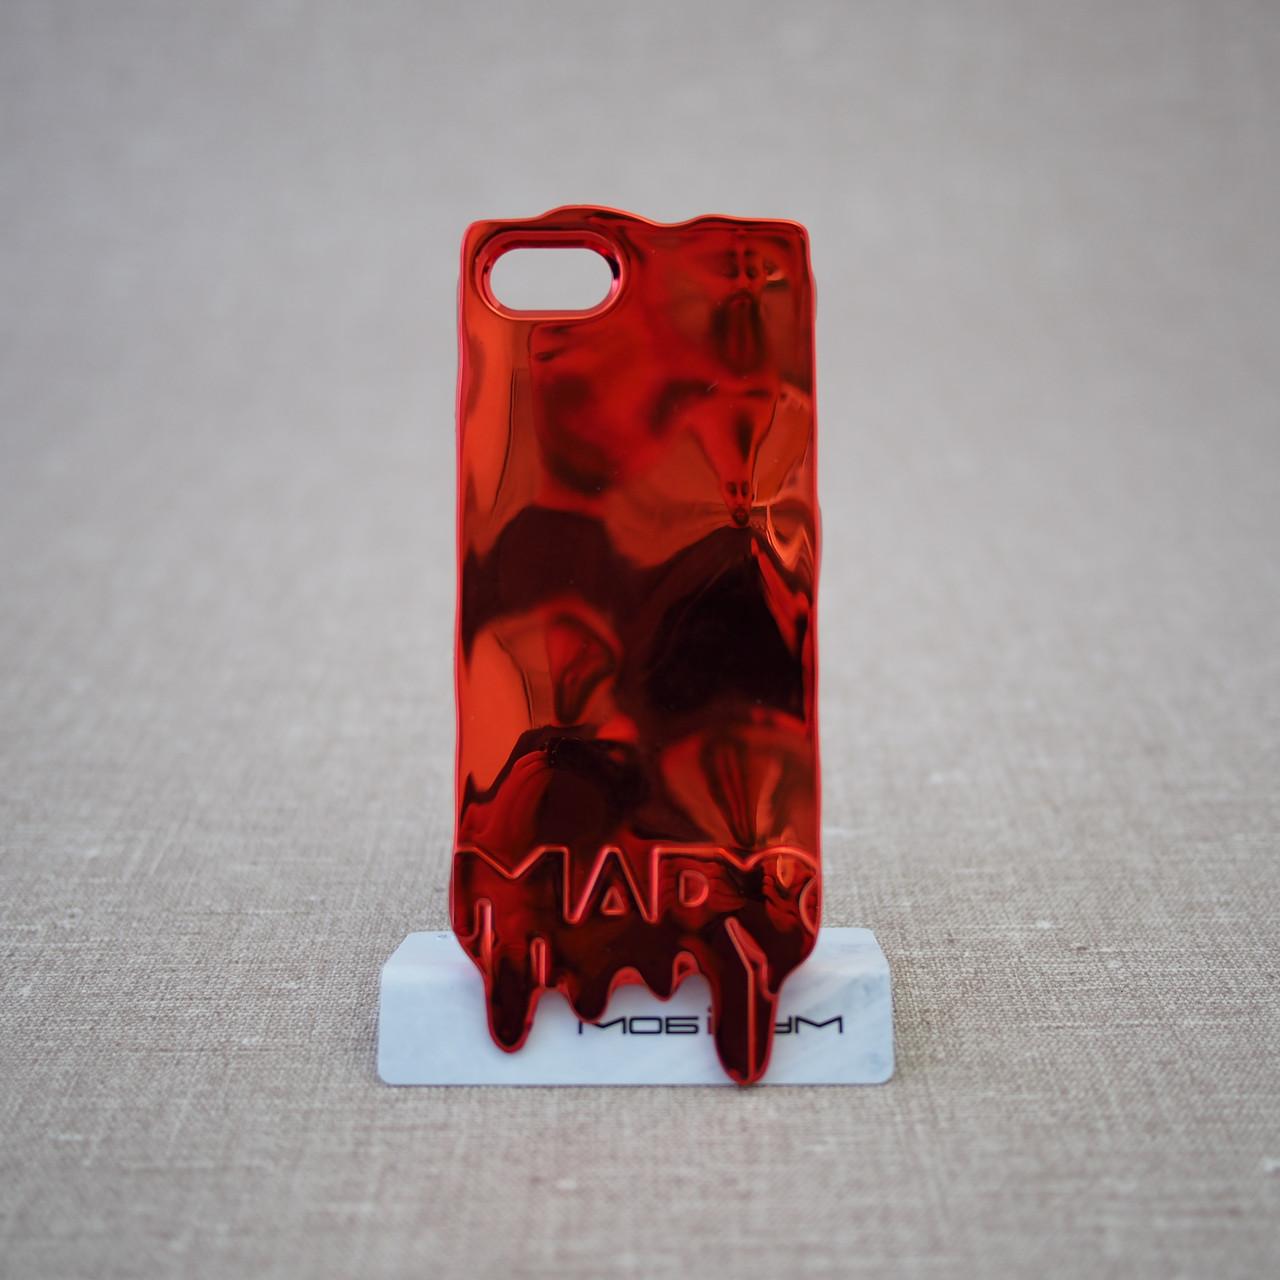 Чехол MARC JACOBS Fashion Melt Case for iPhone 5s/SE red (MJ-MELT-REDD)